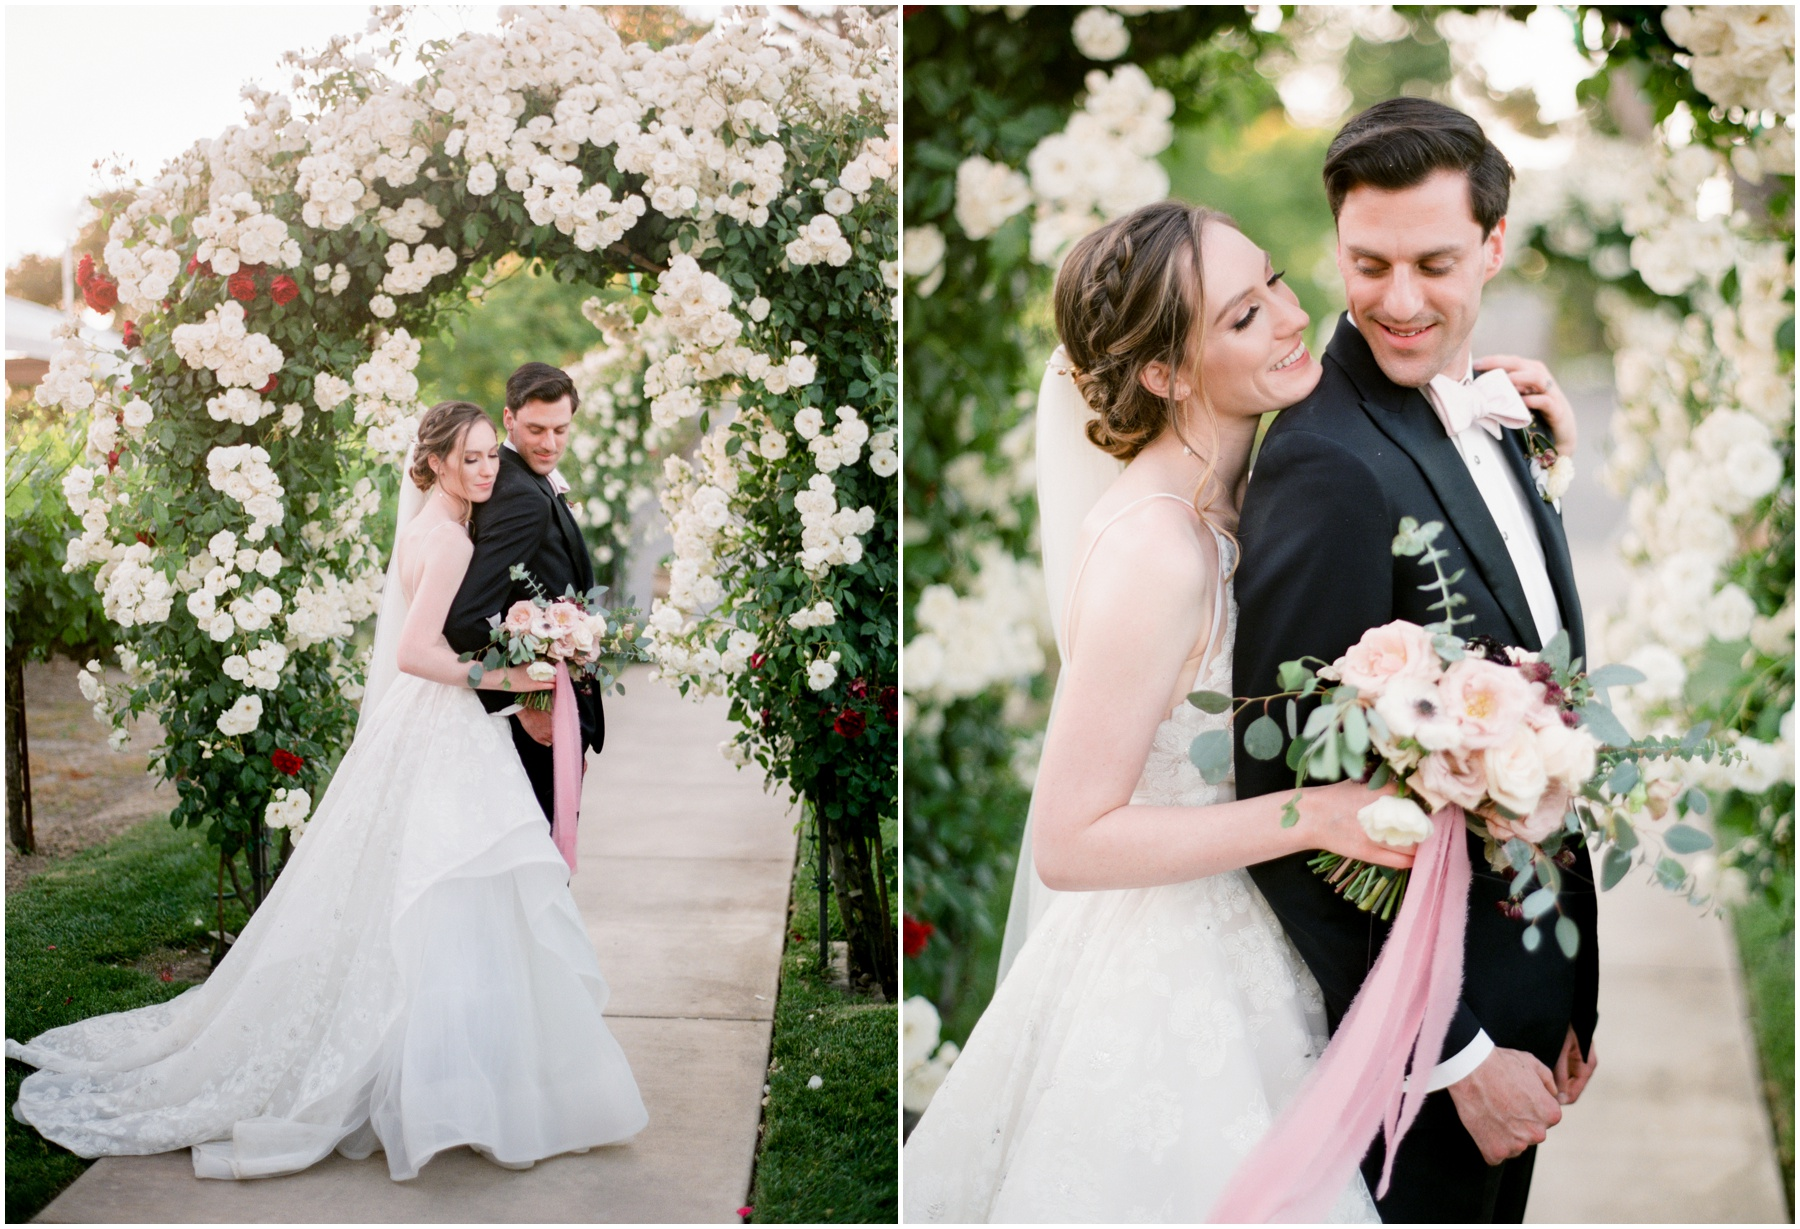 Scribner-bend-vineyards-wedding-sacramento-california-Kristine-Herman-Photography-60.jpg